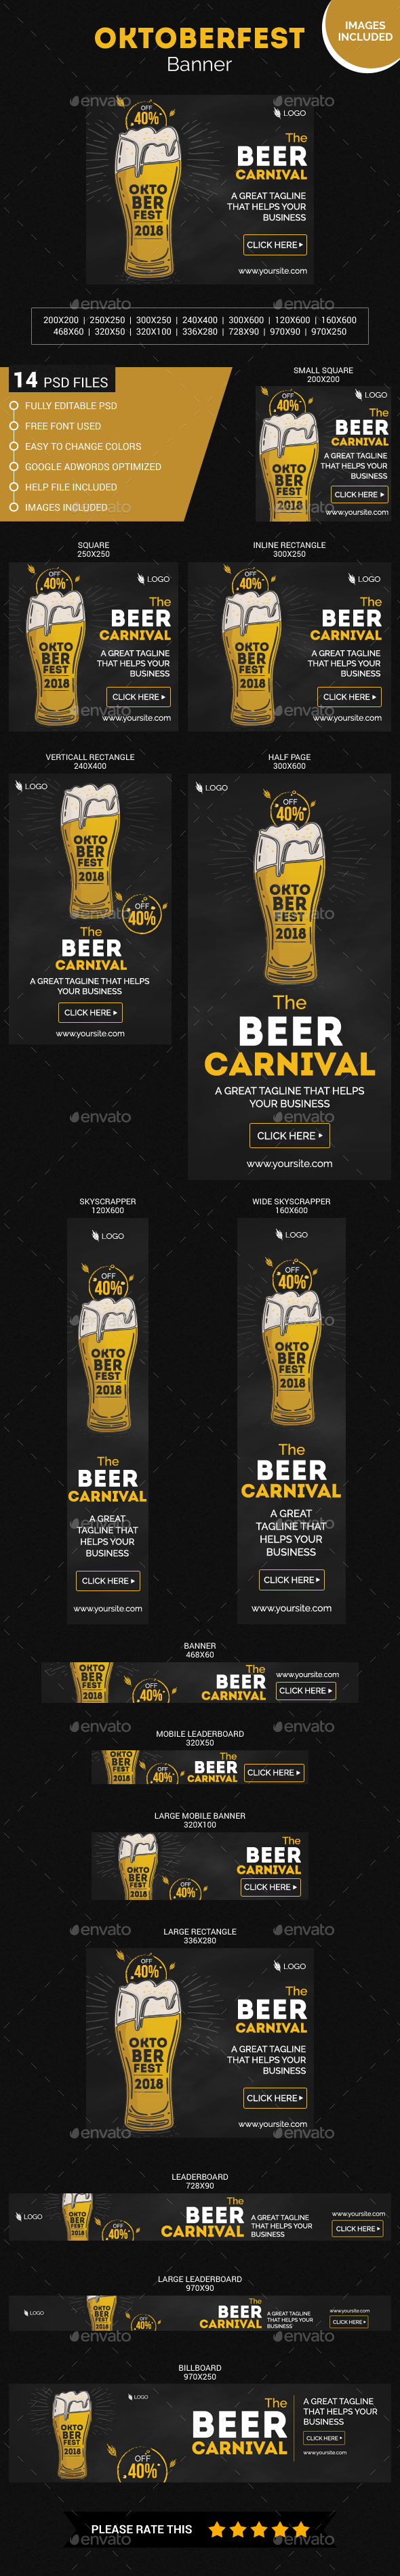 Sketchy Oktoberfest Web Banner - Banners & Ads Web Elements